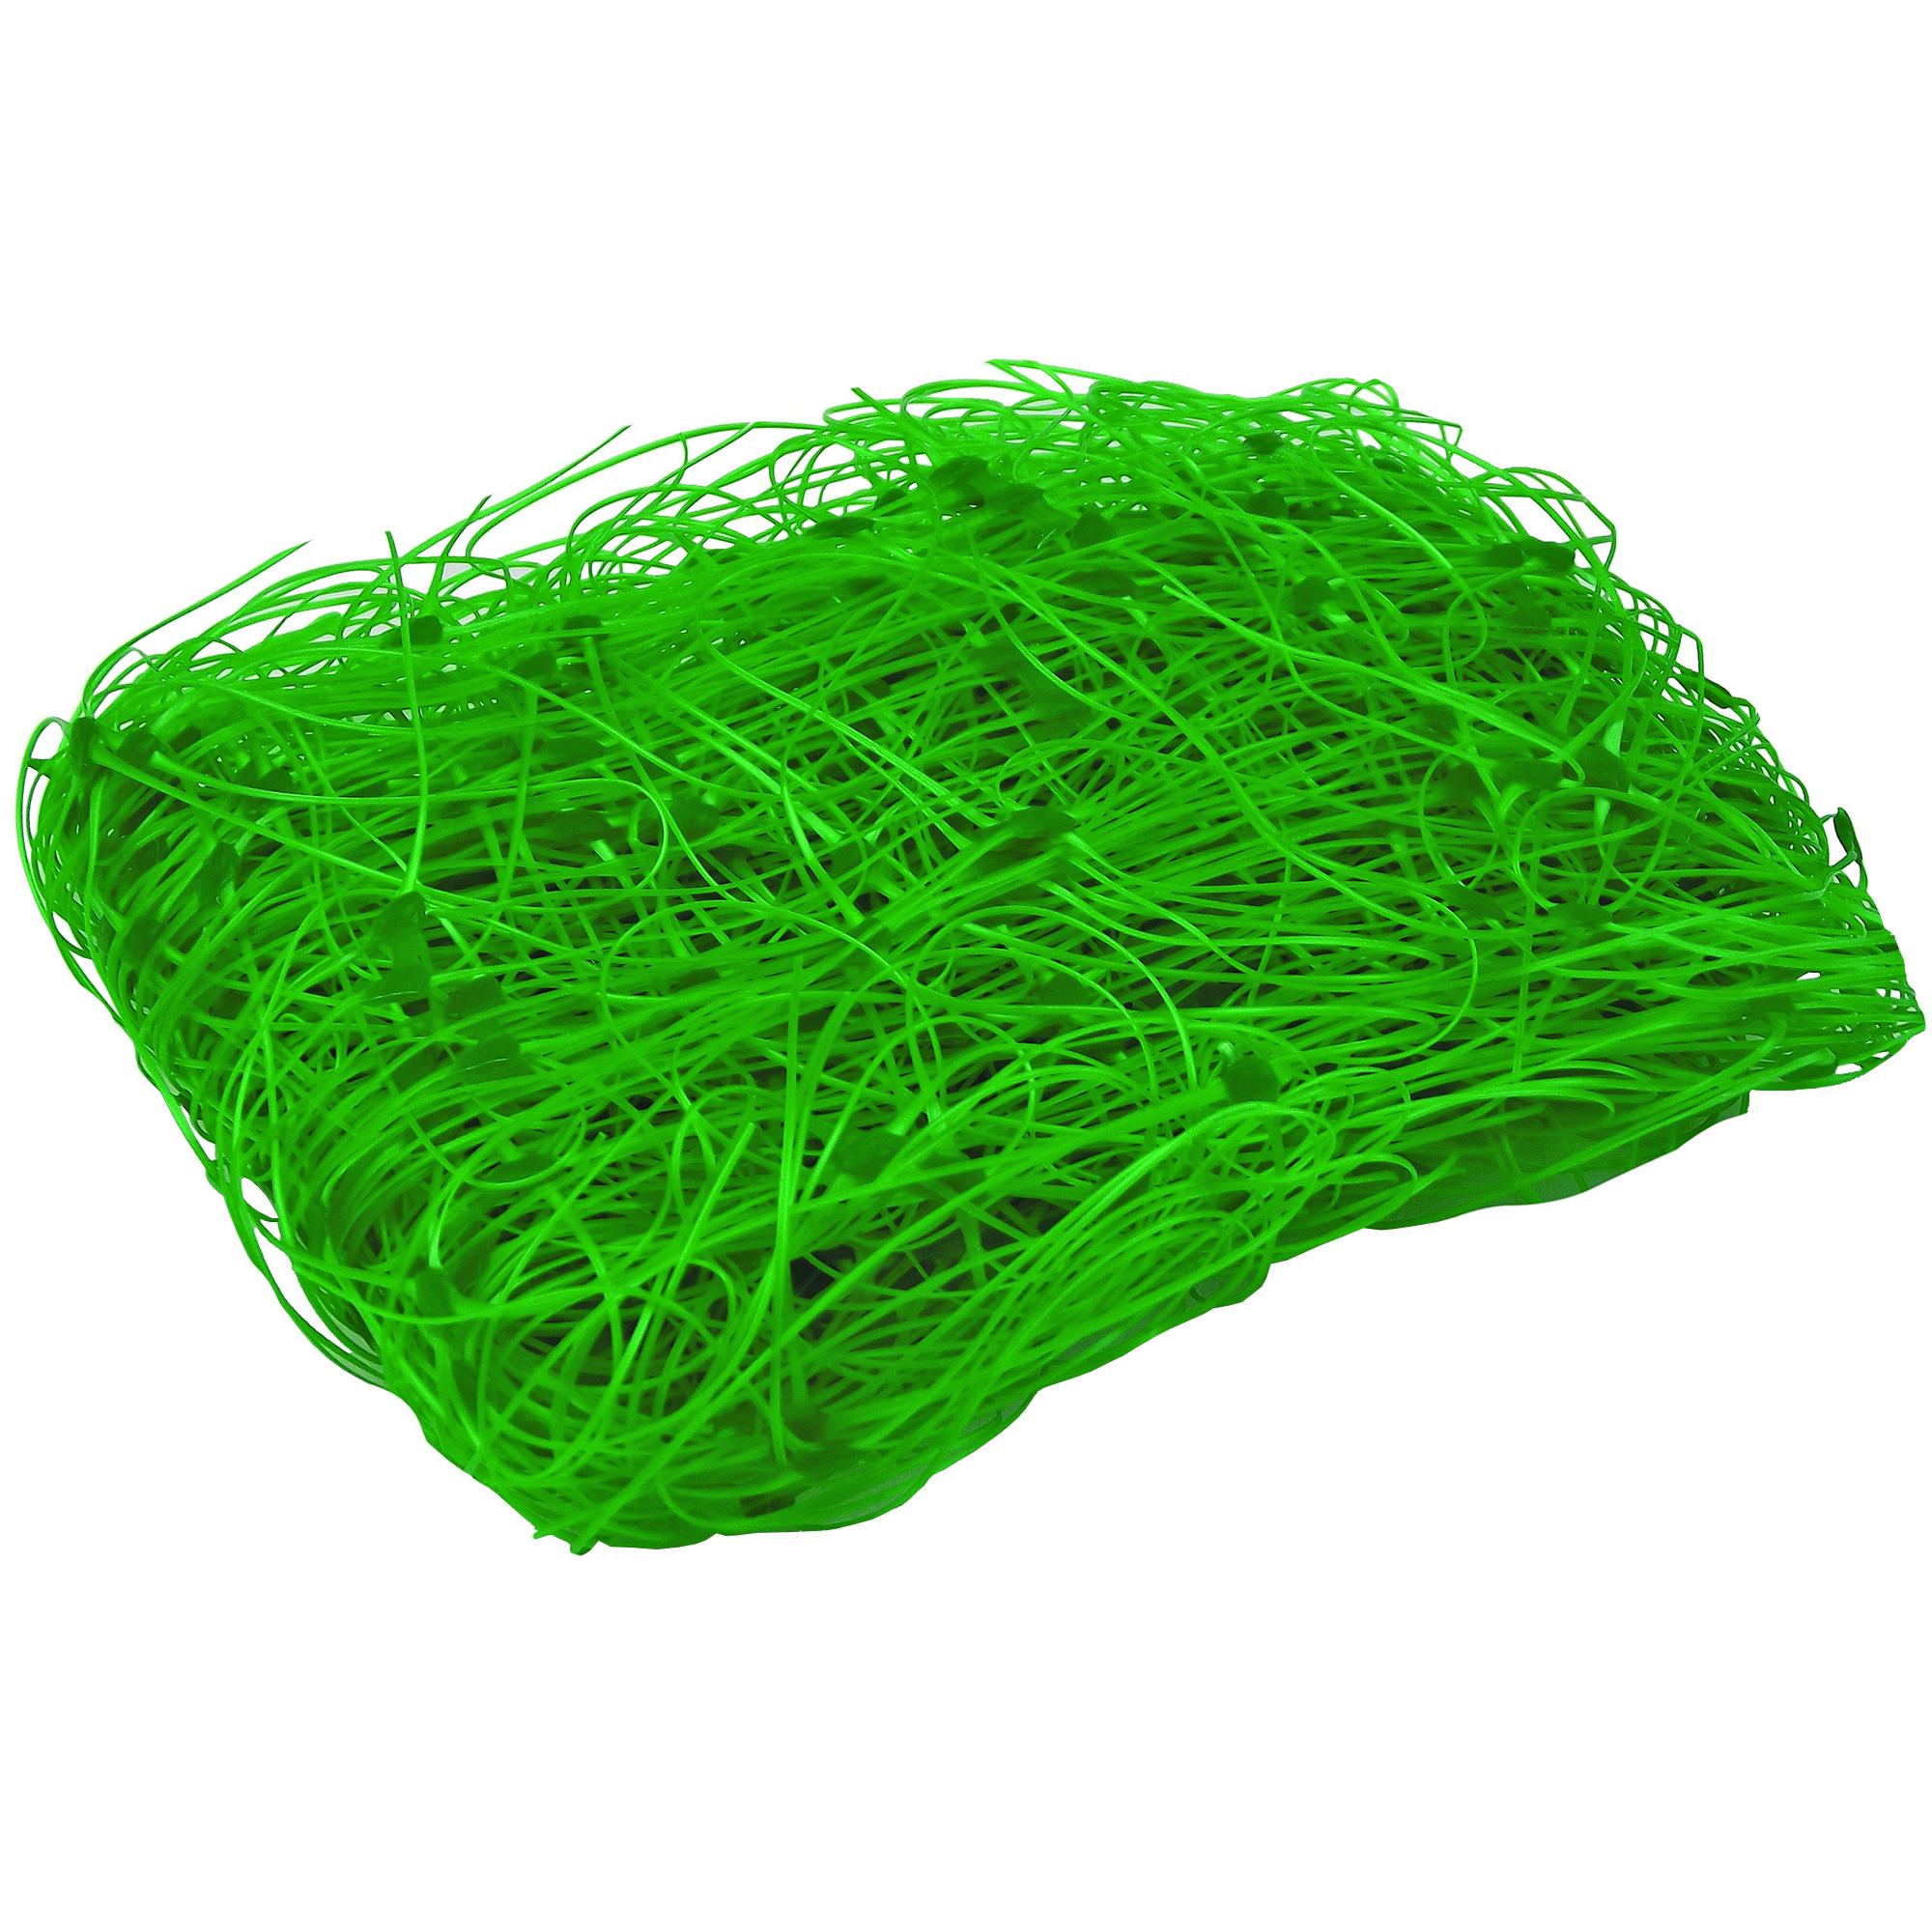 Plasa verde pentru castraveti